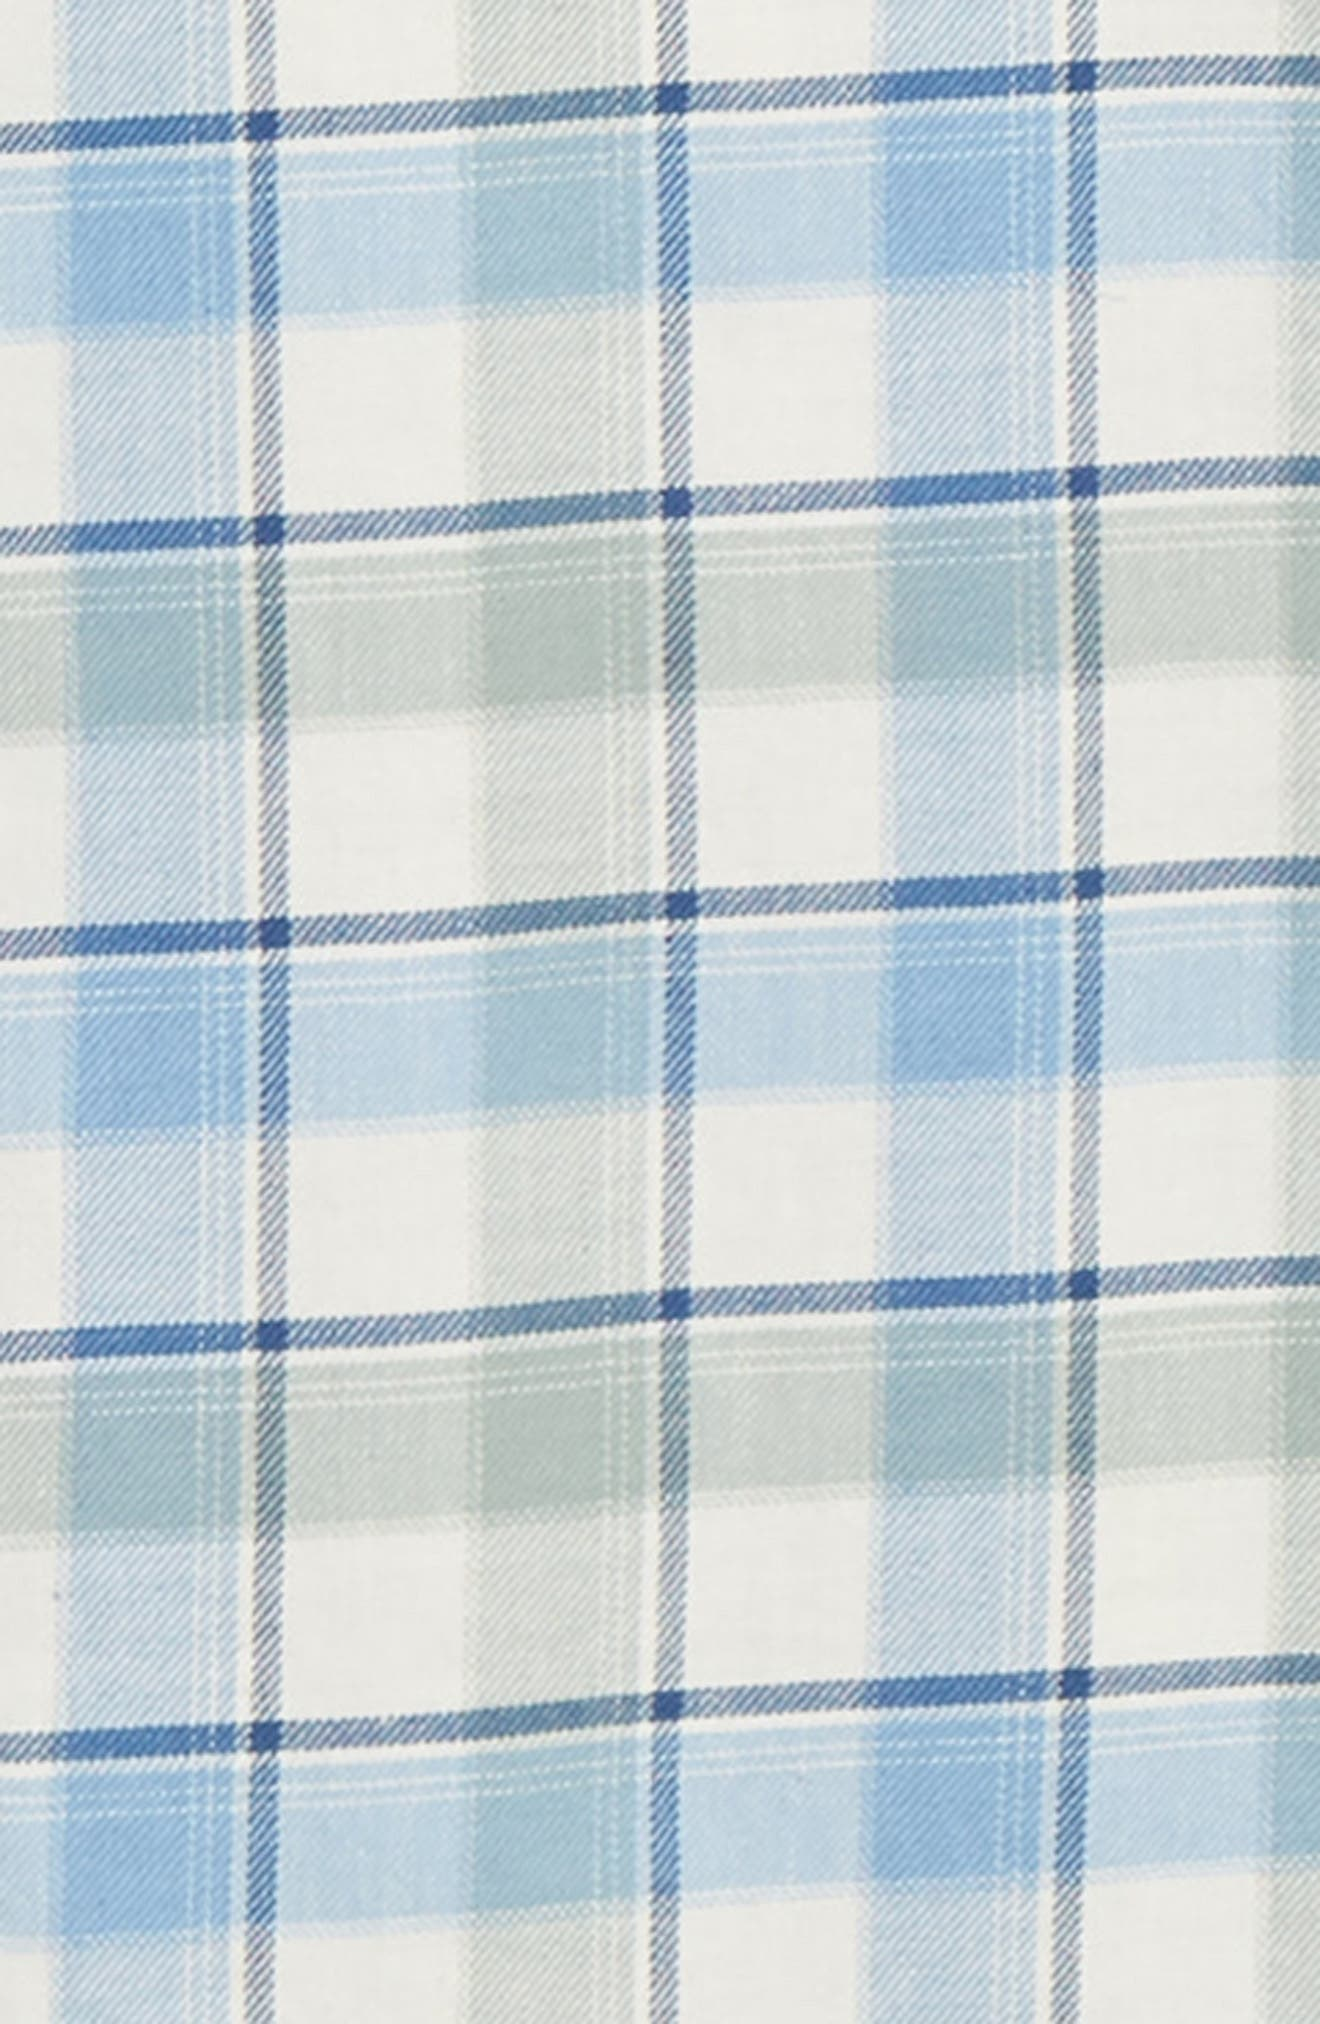 VINEYARD VINES,                             Bayside Slim Fit Plaid Sport Shirt,                             Alternate thumbnail 6, color,                             LIGHT SAGE